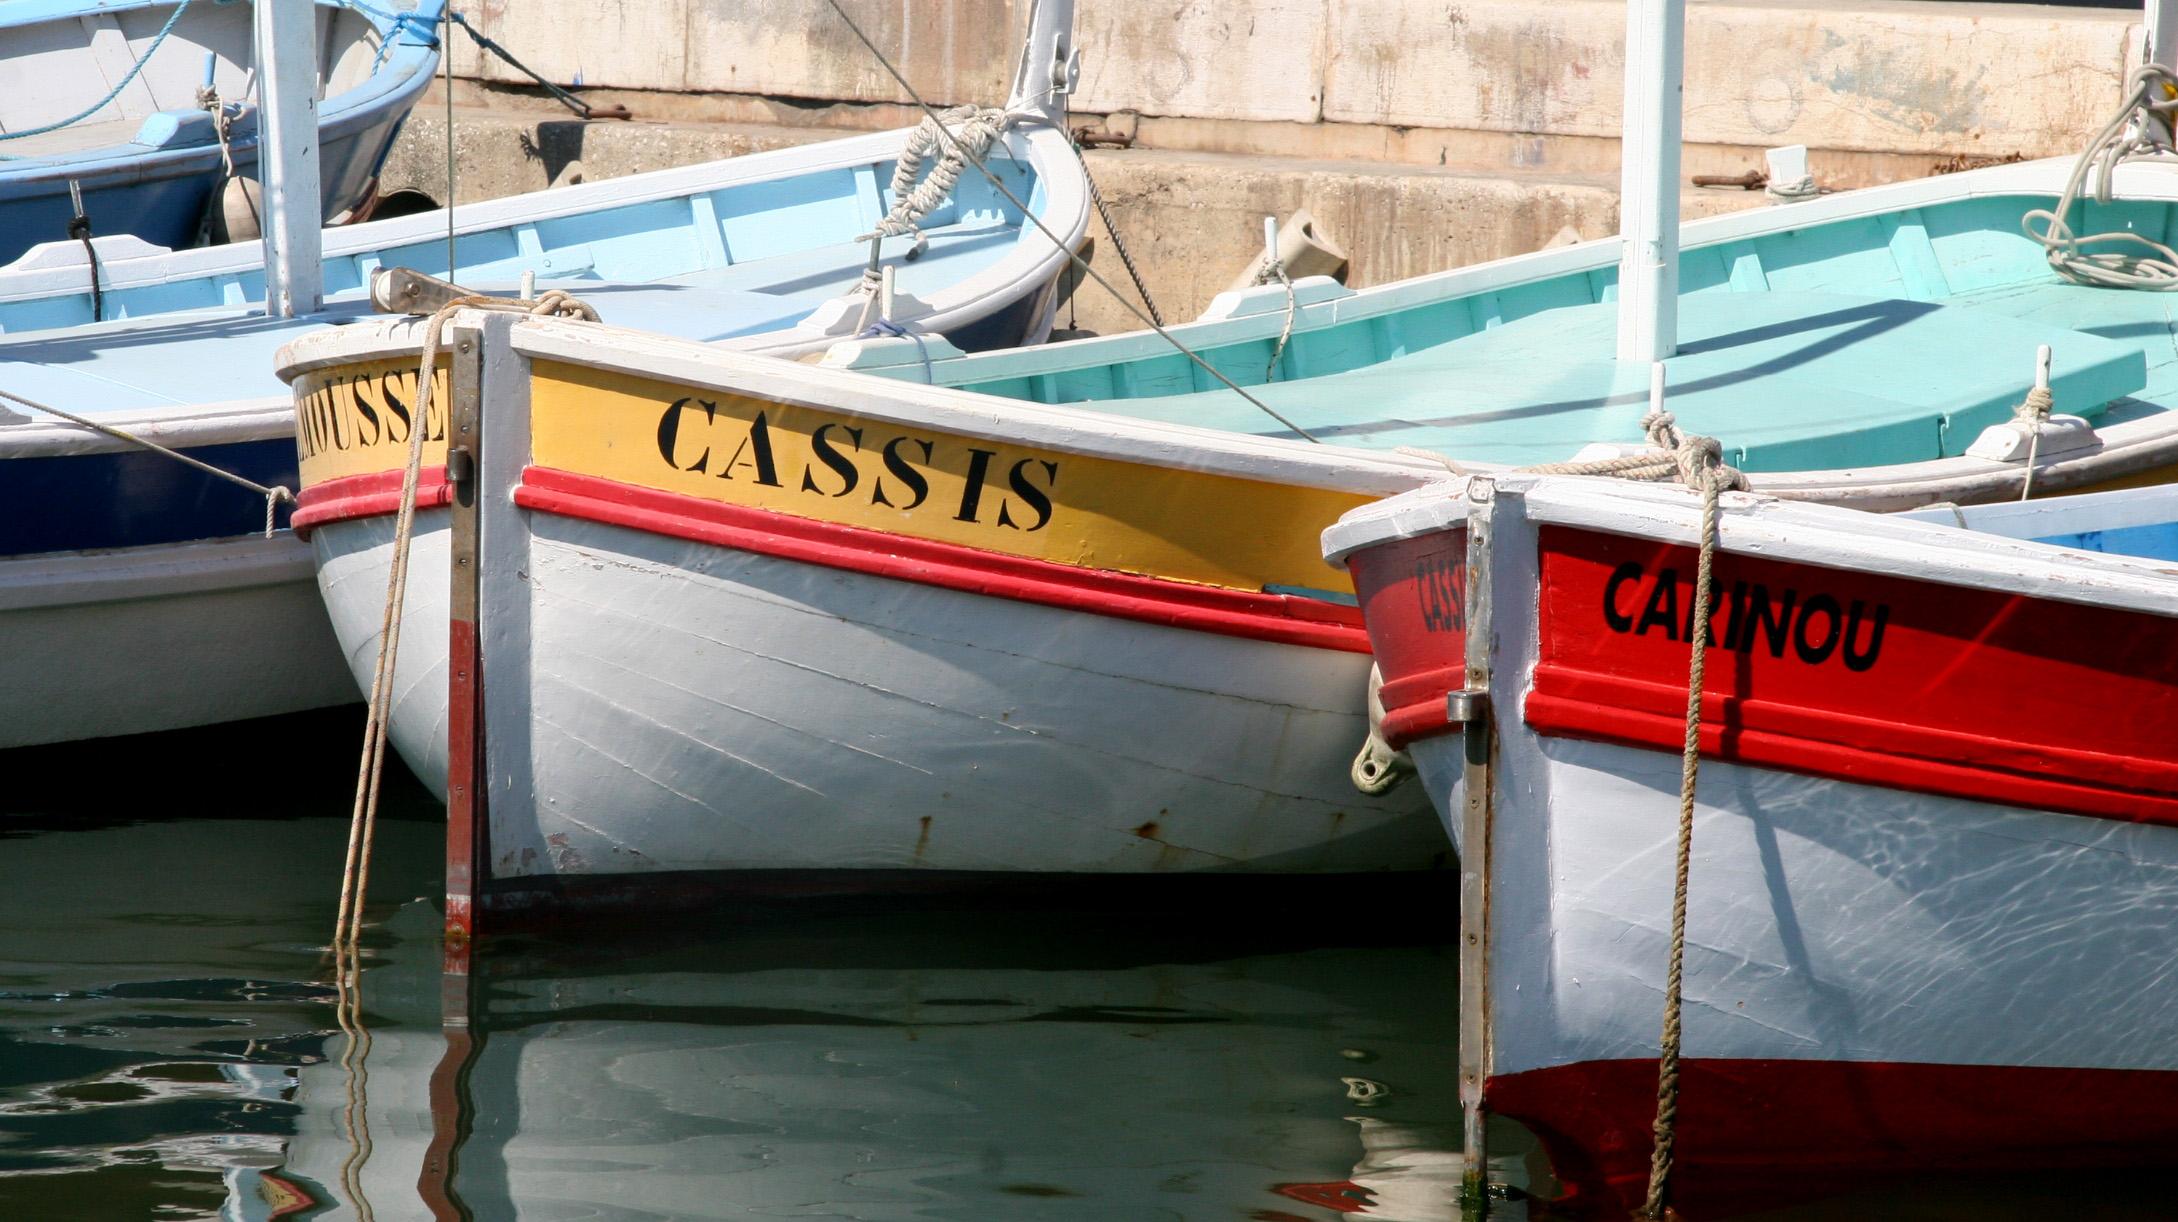 MV #2.1 - Cassis - Toulon 035.jpg